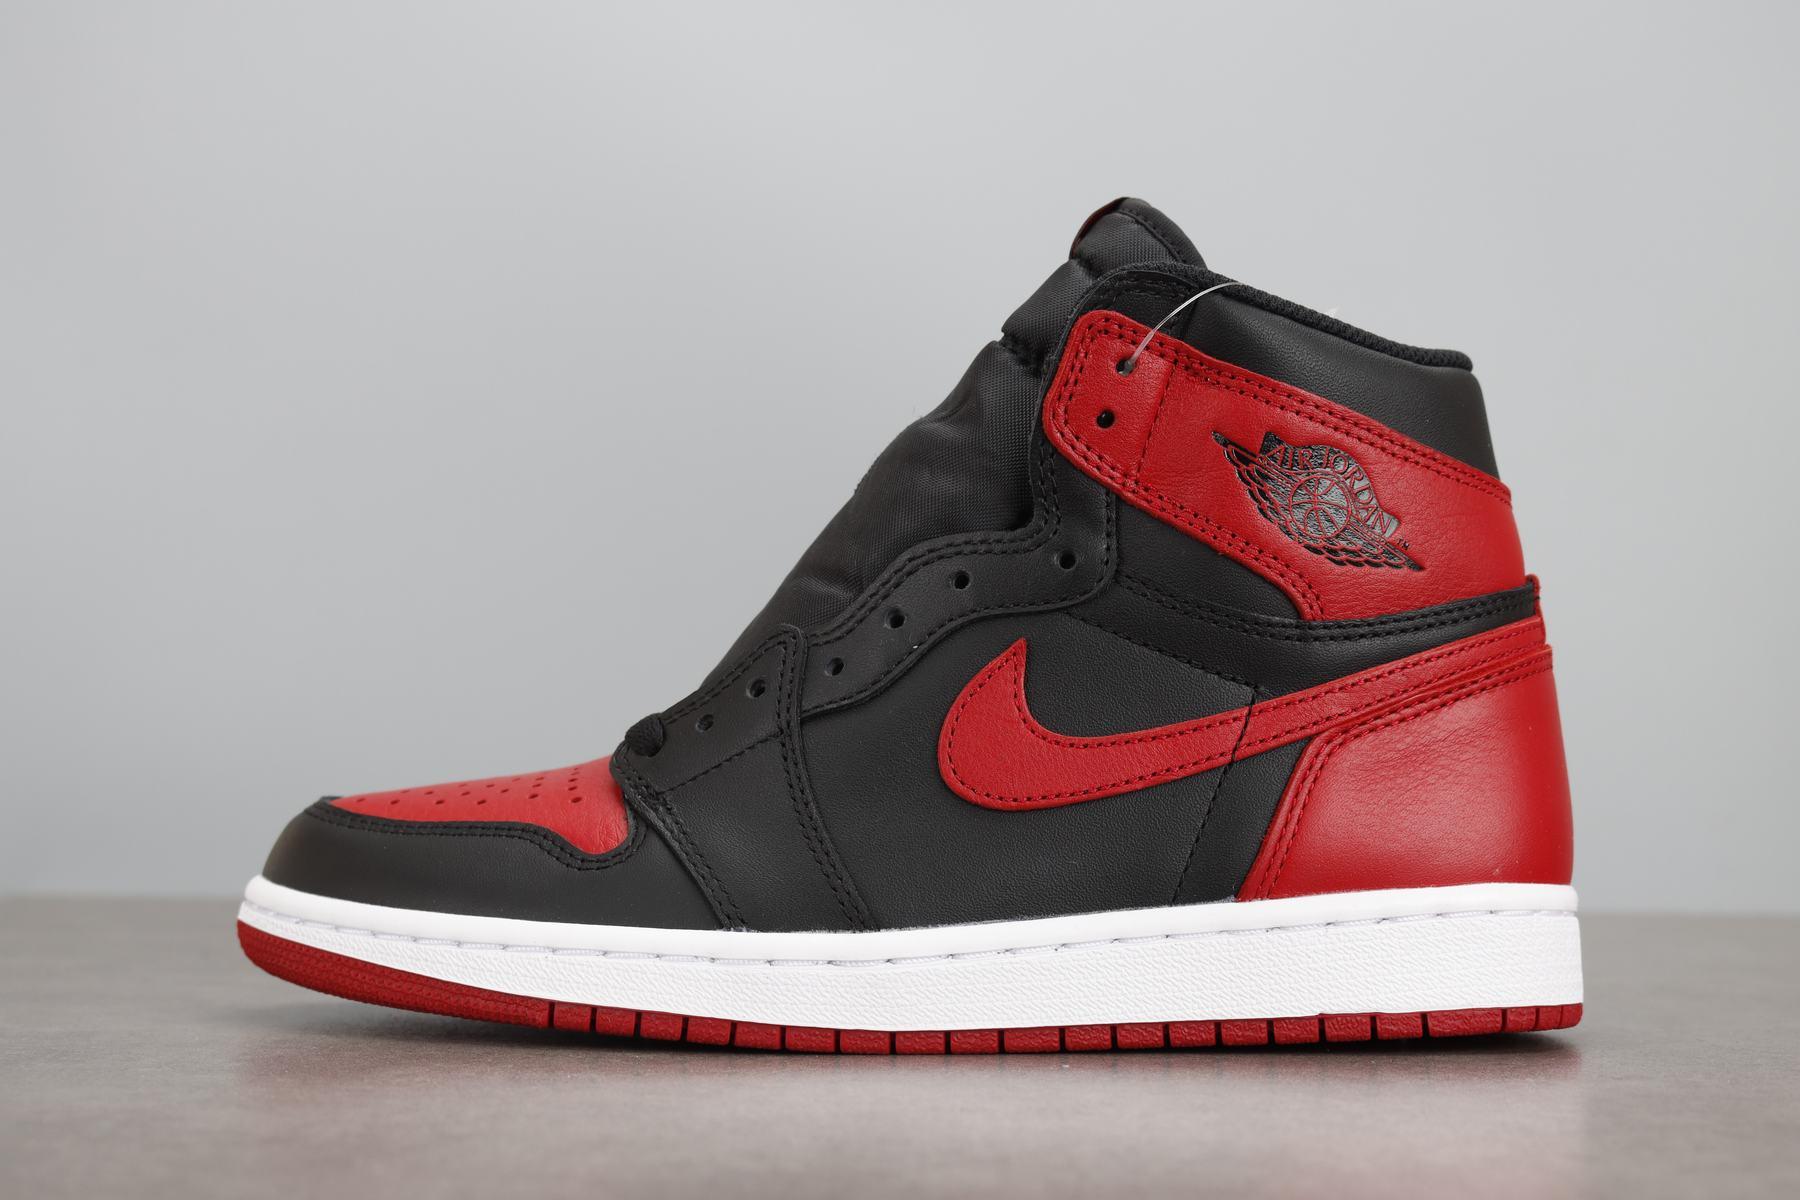 LJR版本 Air Jordan 1 Retro OG AJ1黑红禁穿 乔1 555088-001_ljr版本和h12